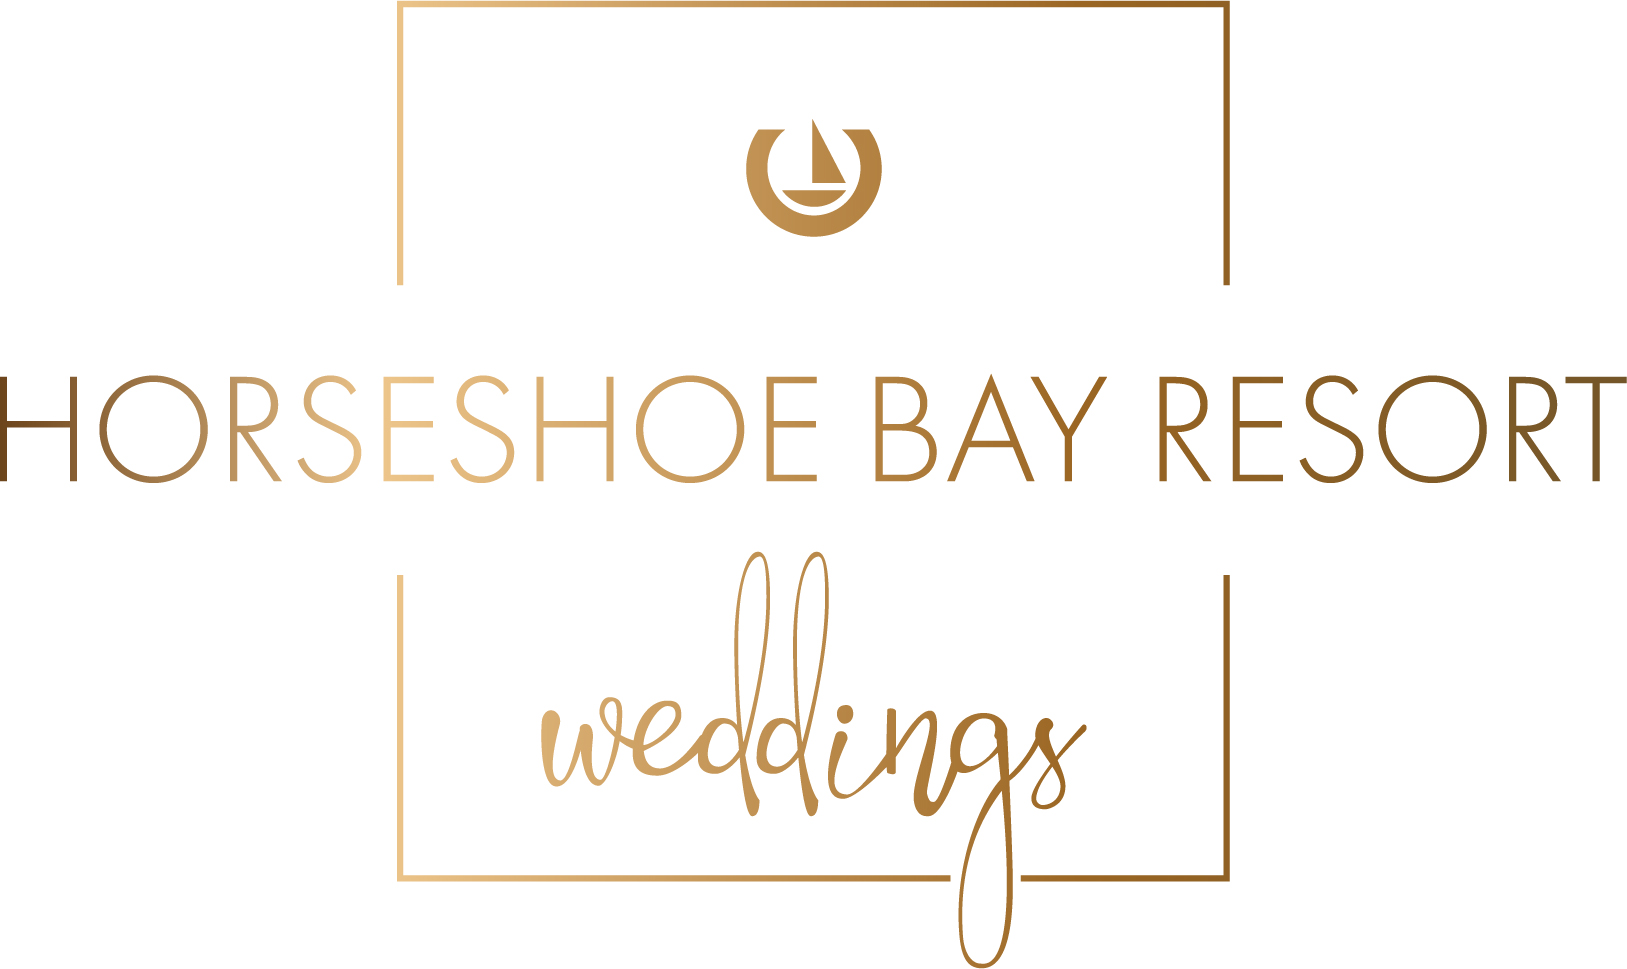 Horseshoe Bay Resort Accommodations, Venues